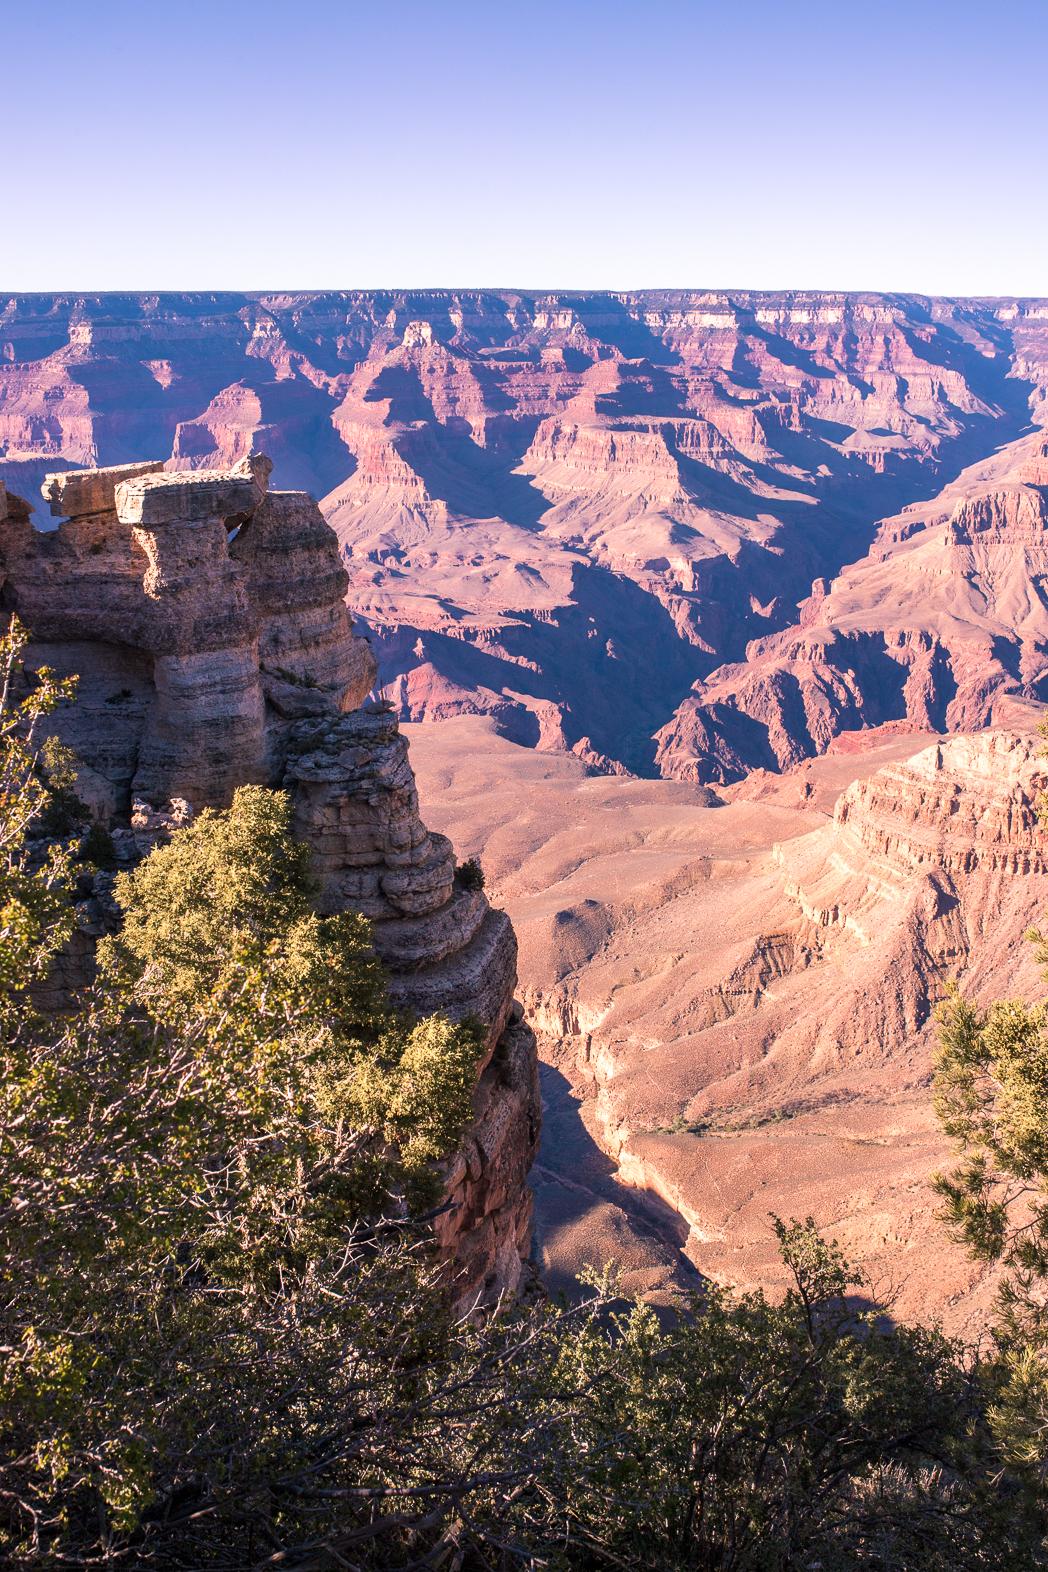 Stacie Flinner Grand Canyon Artemis Design Co-1.jpg